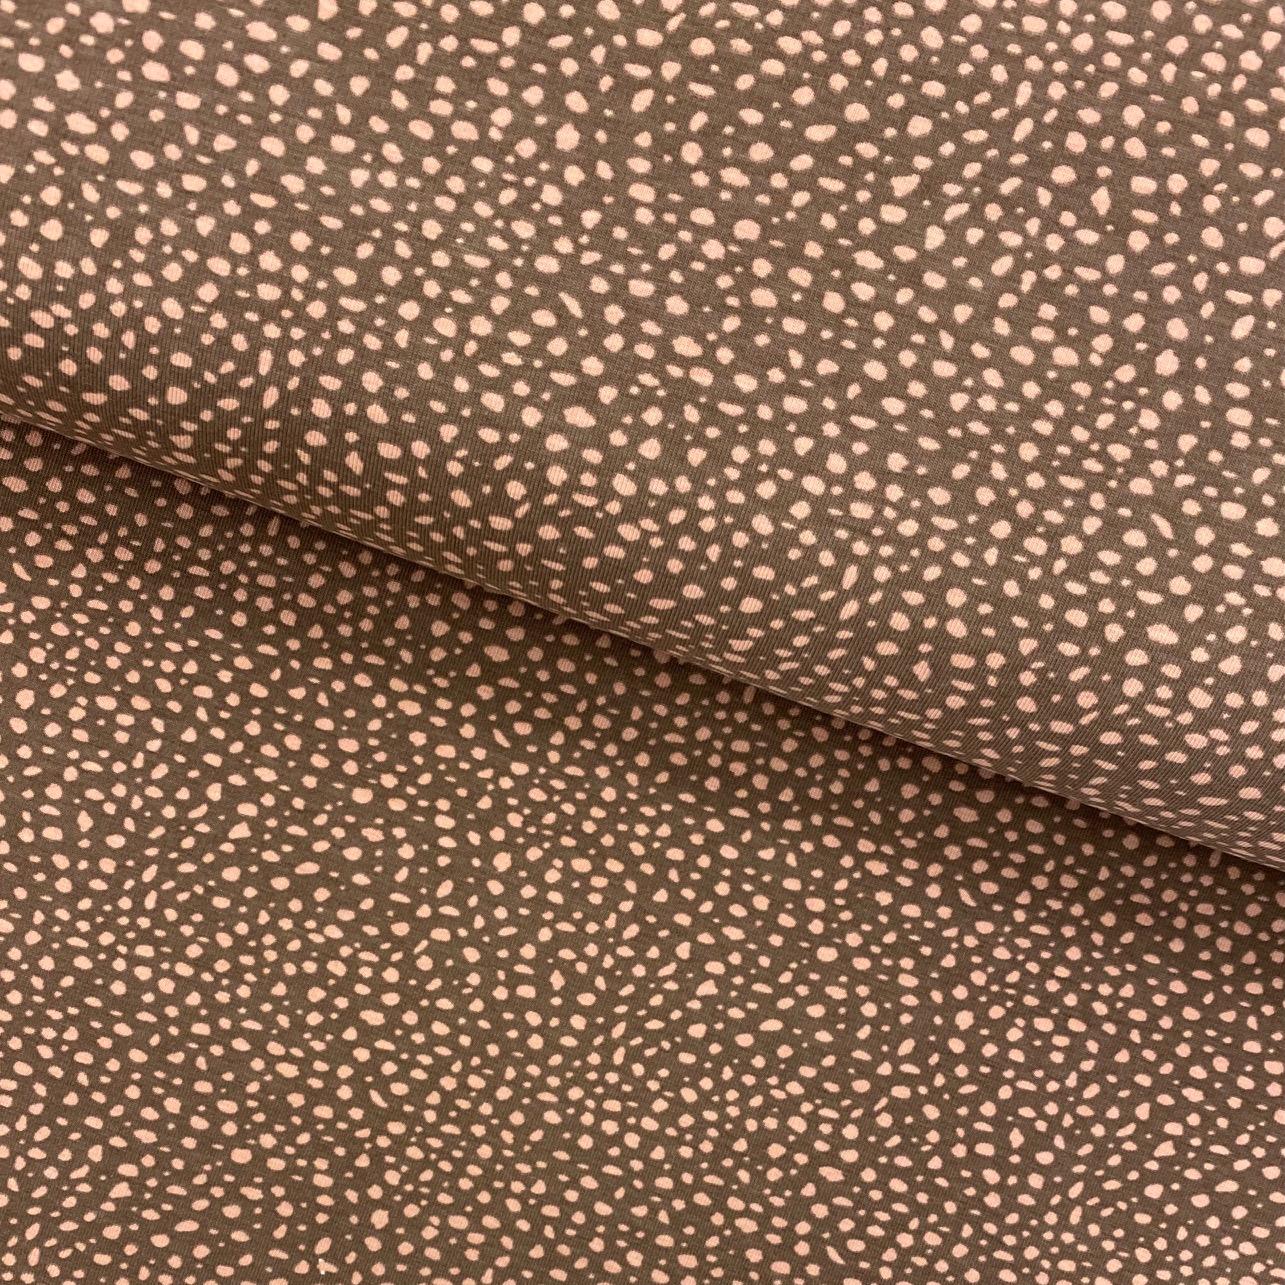 Baumwolljersey, Punkte, rosa-braun. Art. 4949-1519